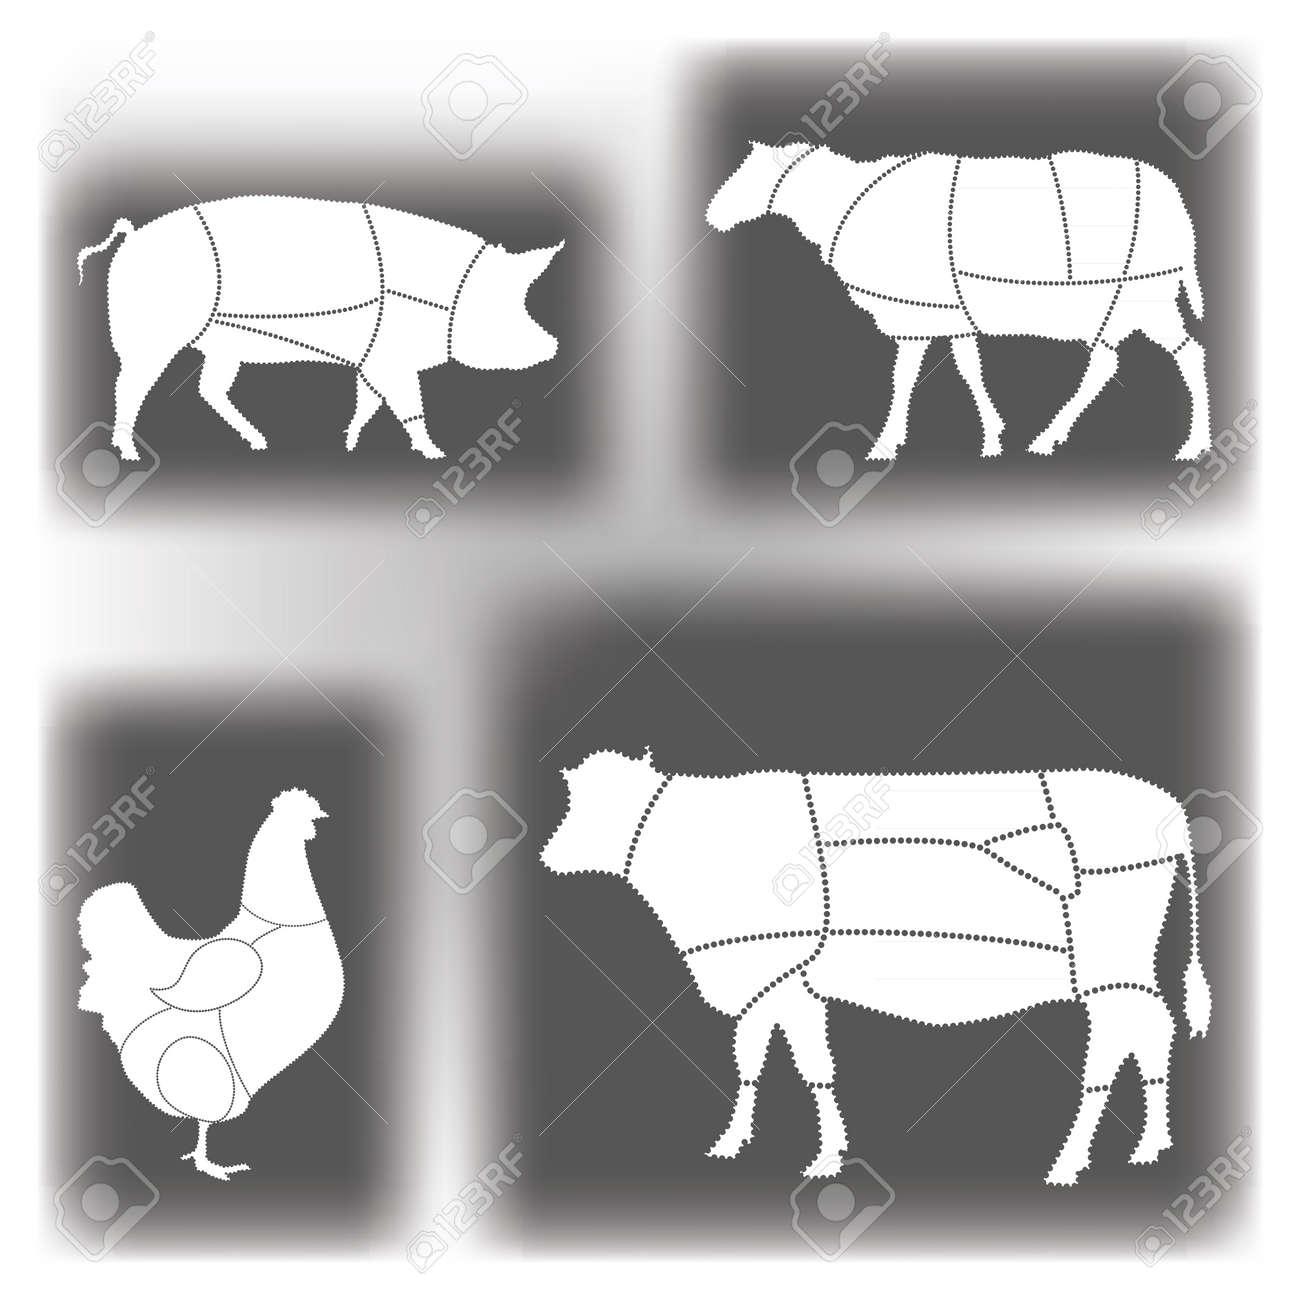 Meat diagrams Stock Vector - 10569603